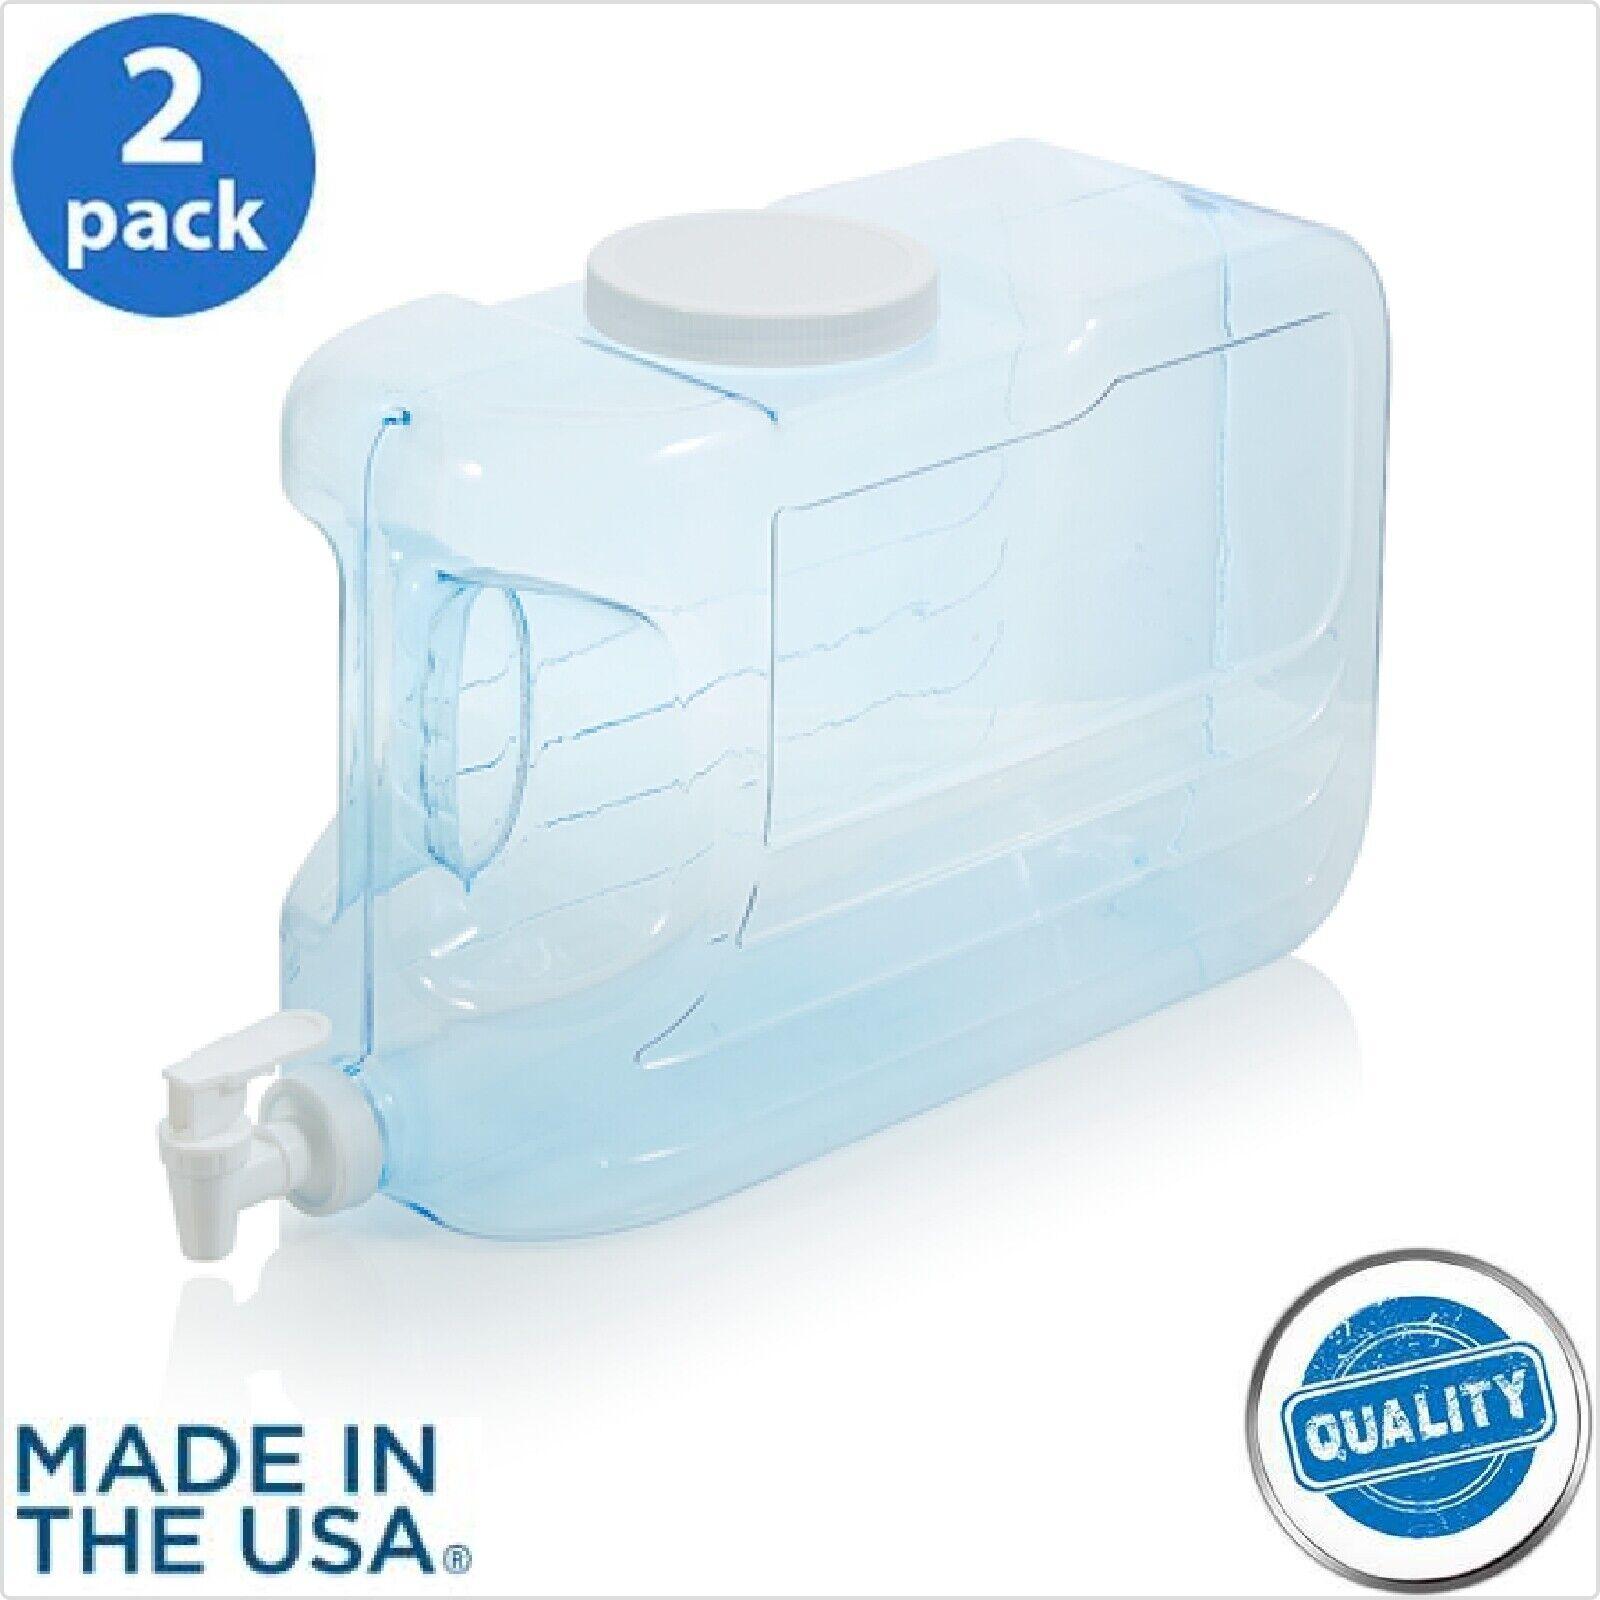 2.5 Gal Slimline Beverage Dispenser BPA Free for Picnics Hom